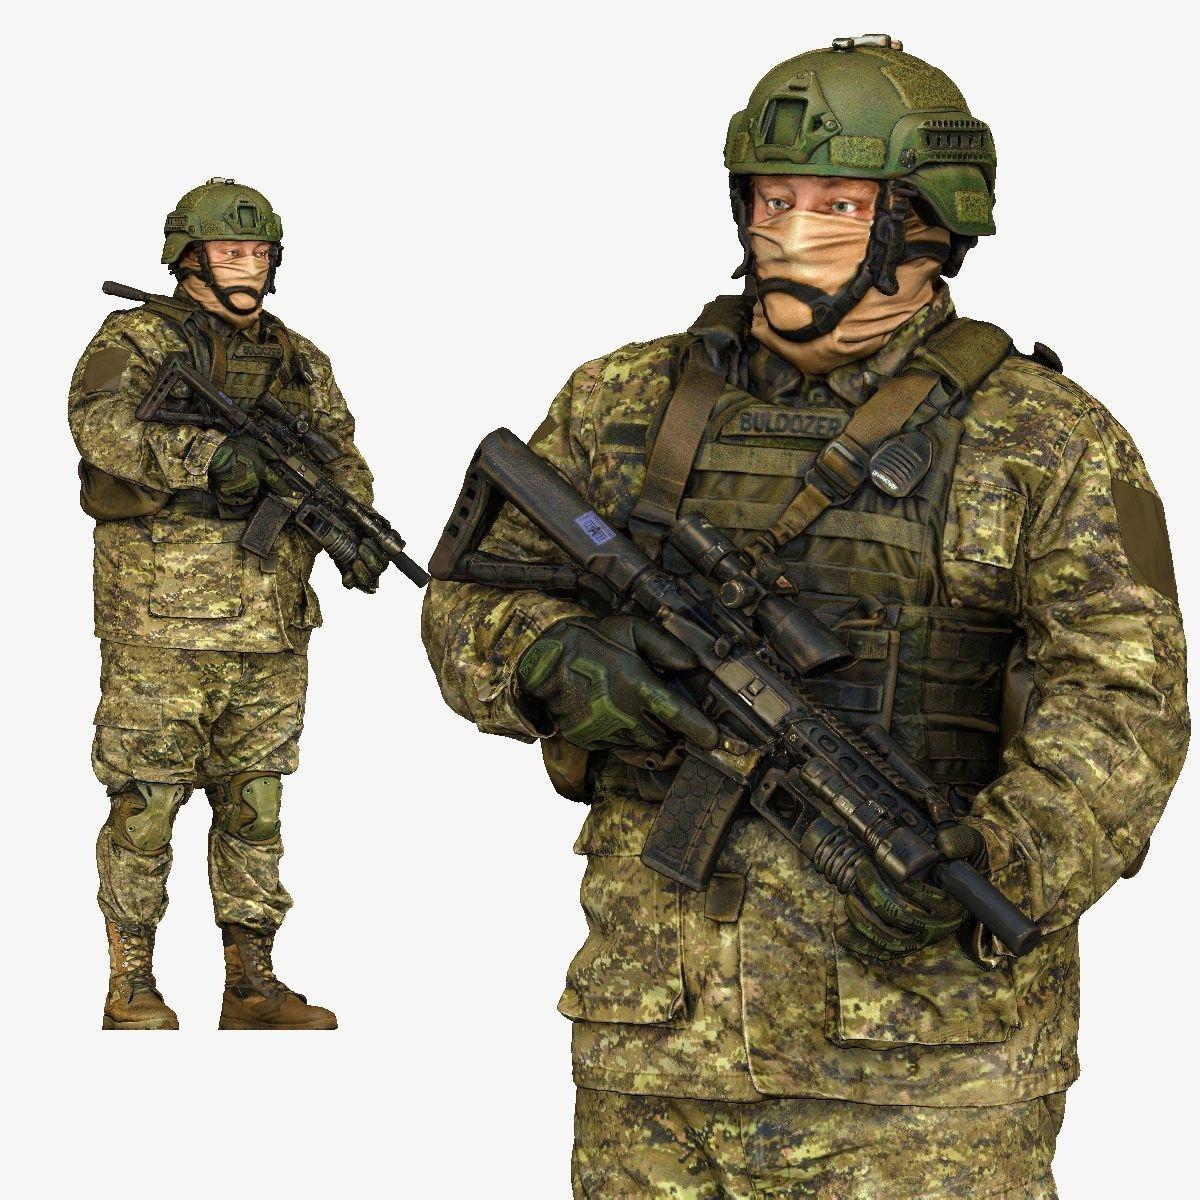 modern soldier in camouflage honeybadger 001149